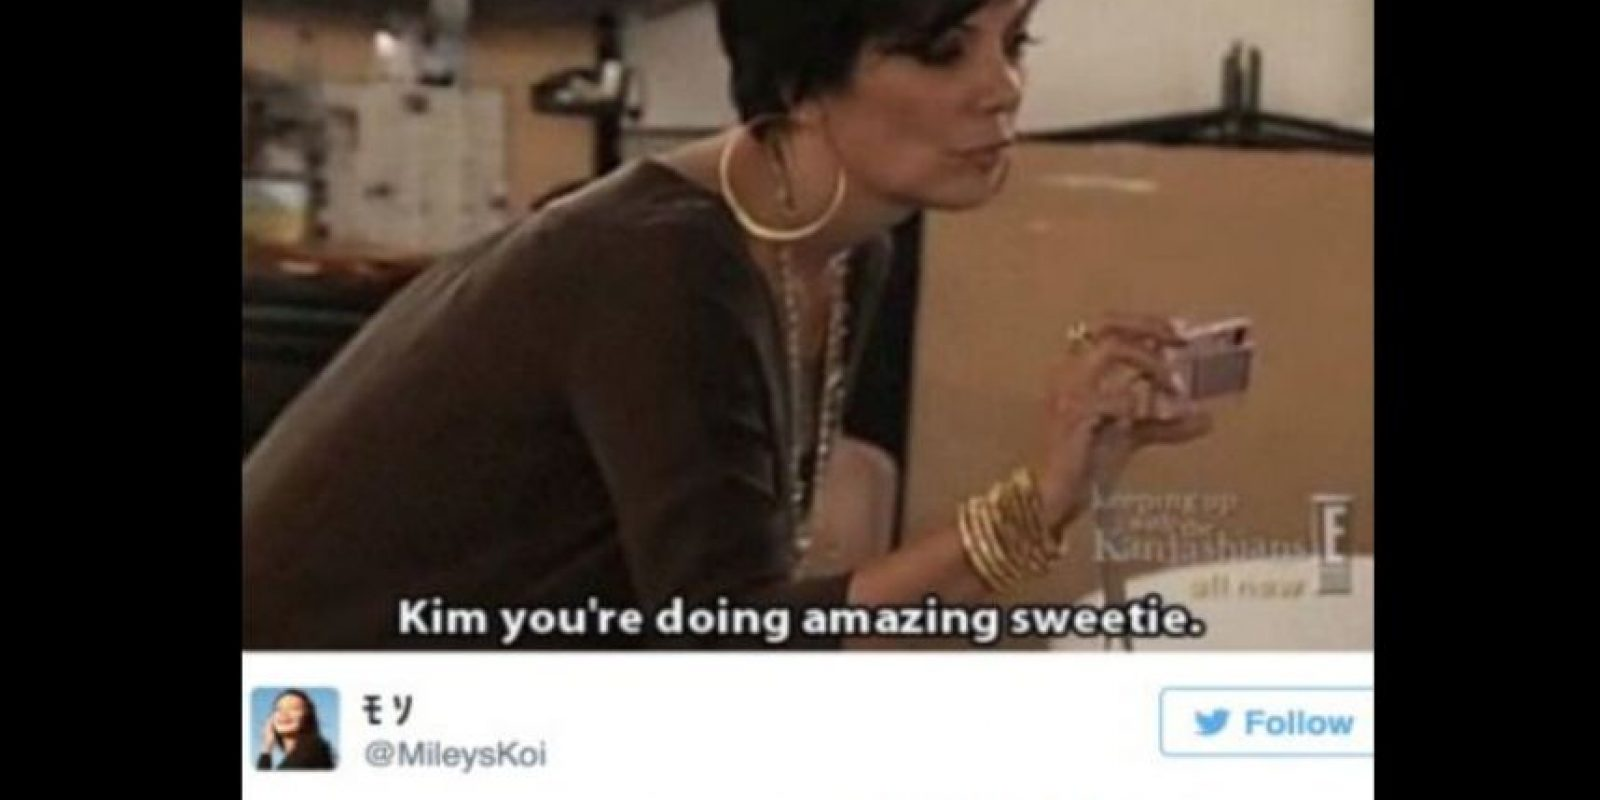 Se burlan de Kris Jenner sin ella tener que ver nada. Foto:vía Twitter